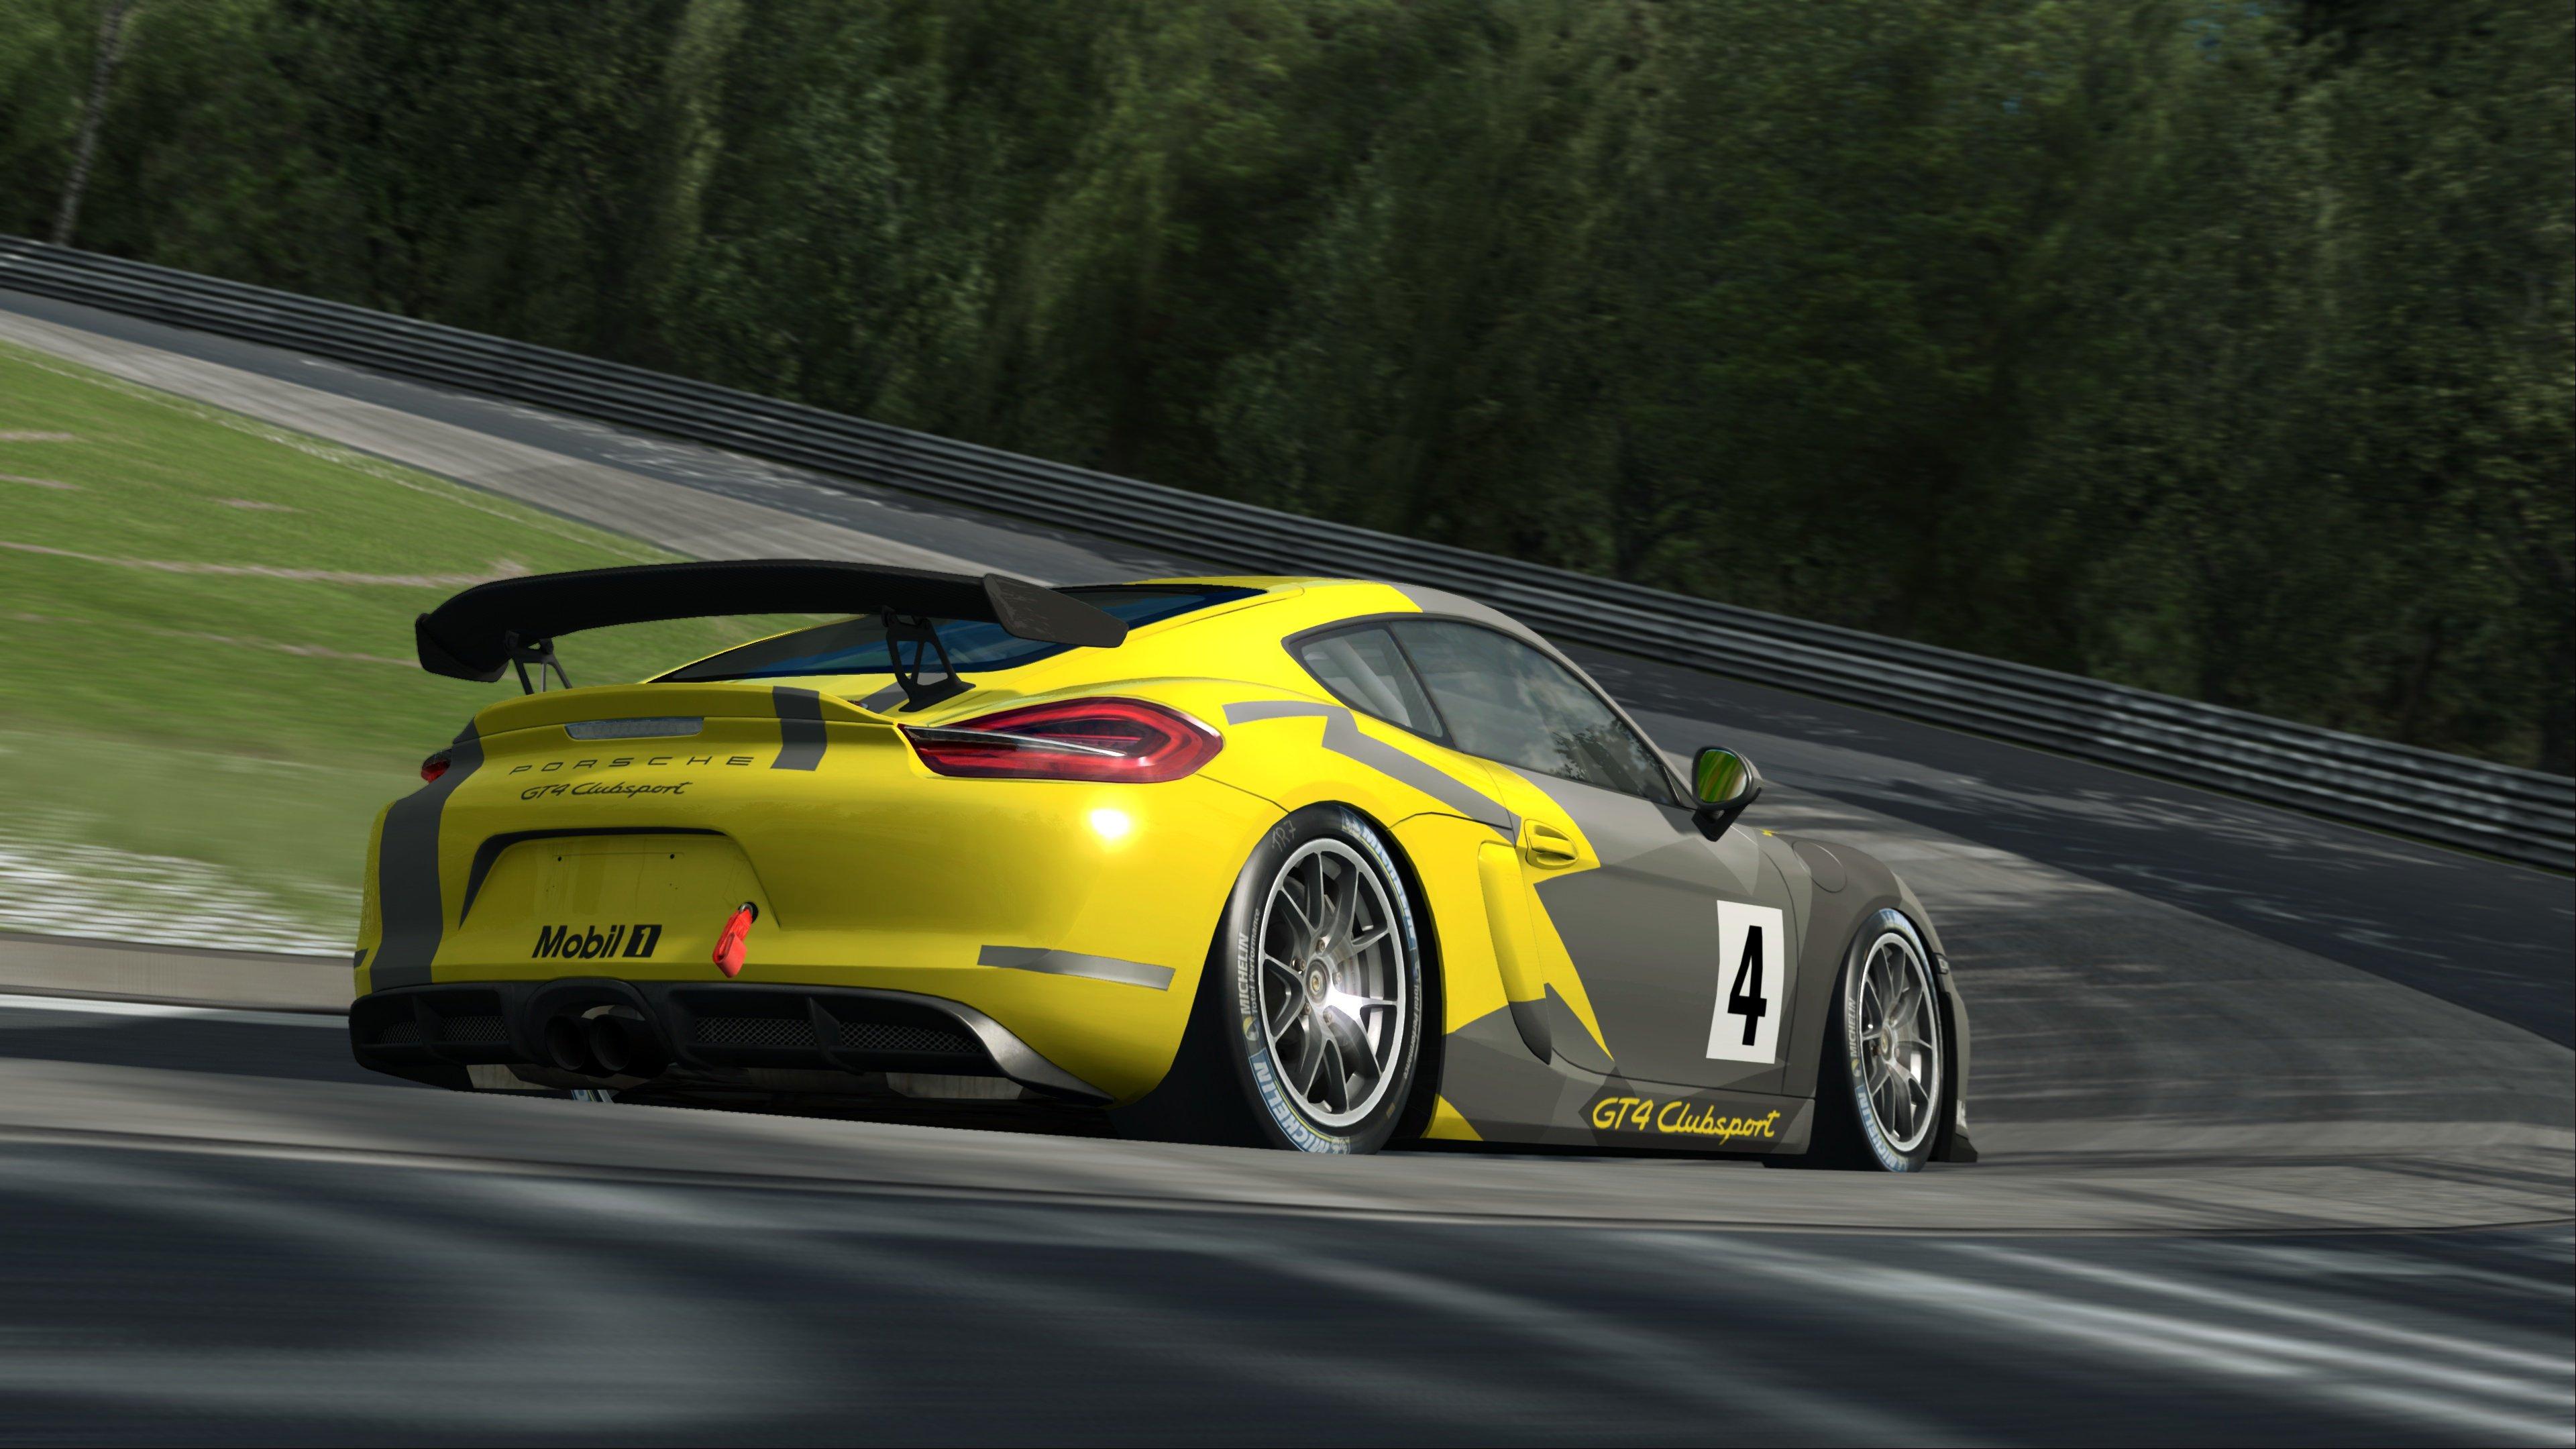 RaceRoom Porsche Cayman GT4 Clubsport 19